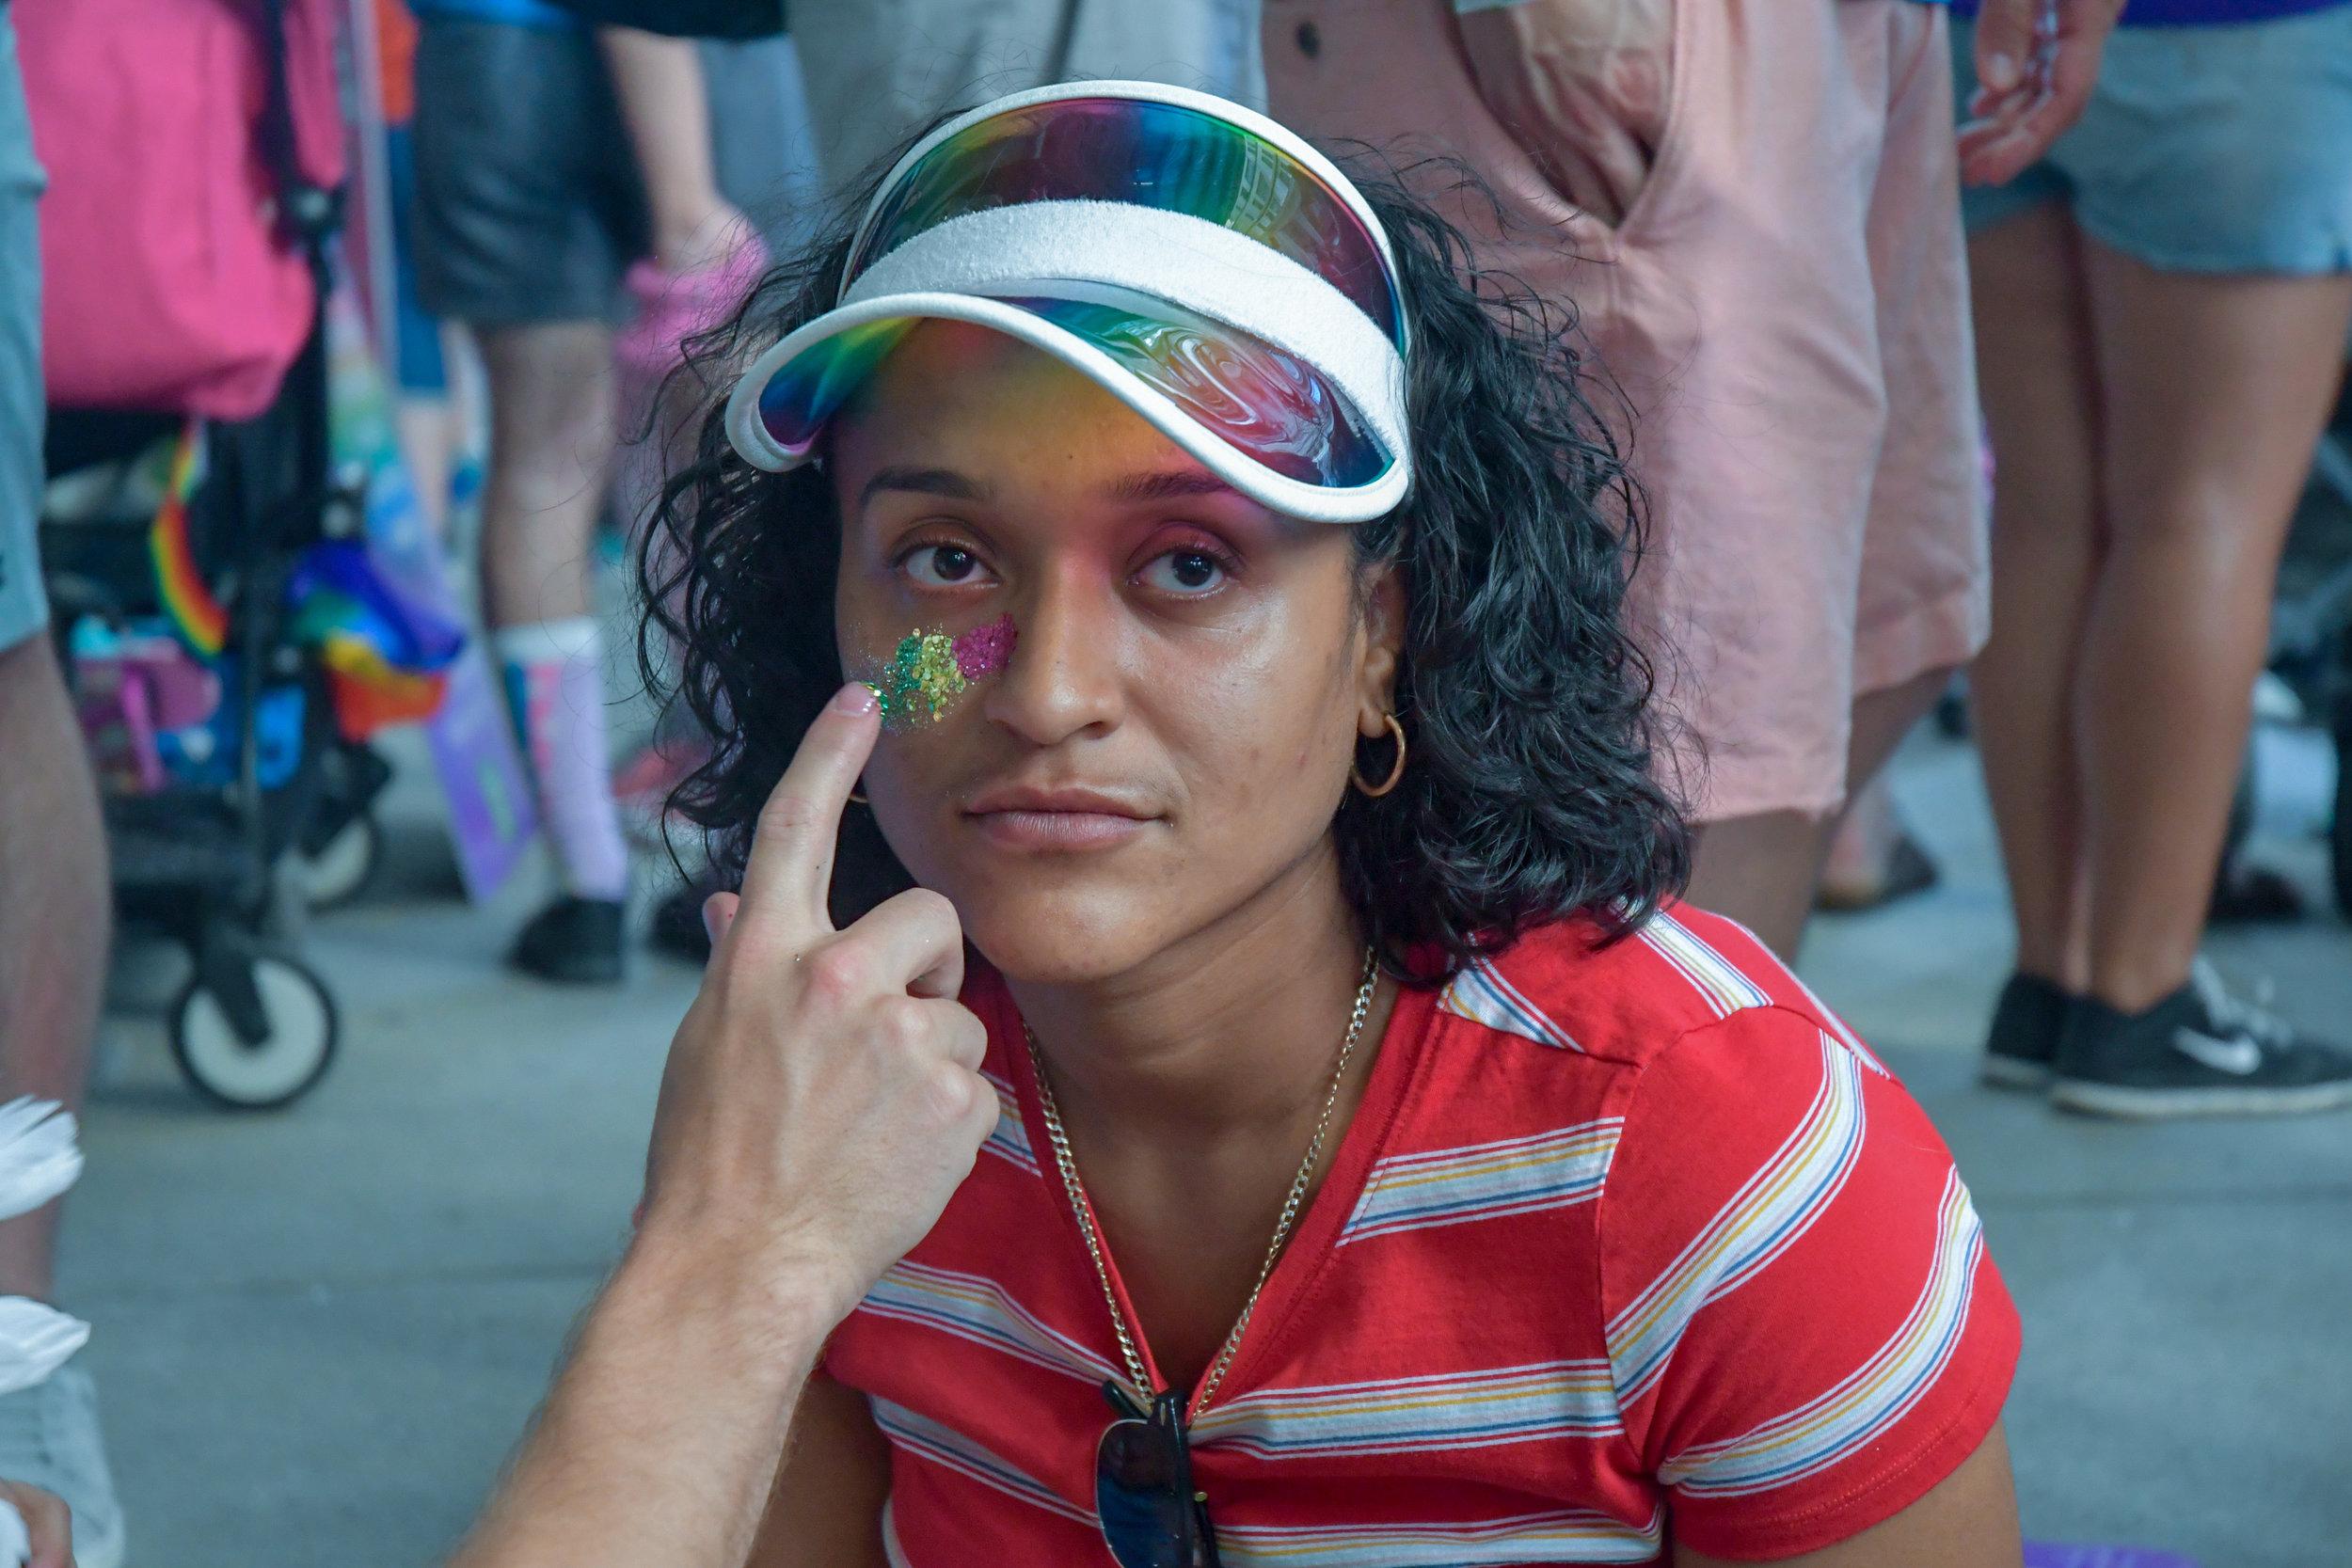 SC-PrideParade-2019_FE-109.jpg